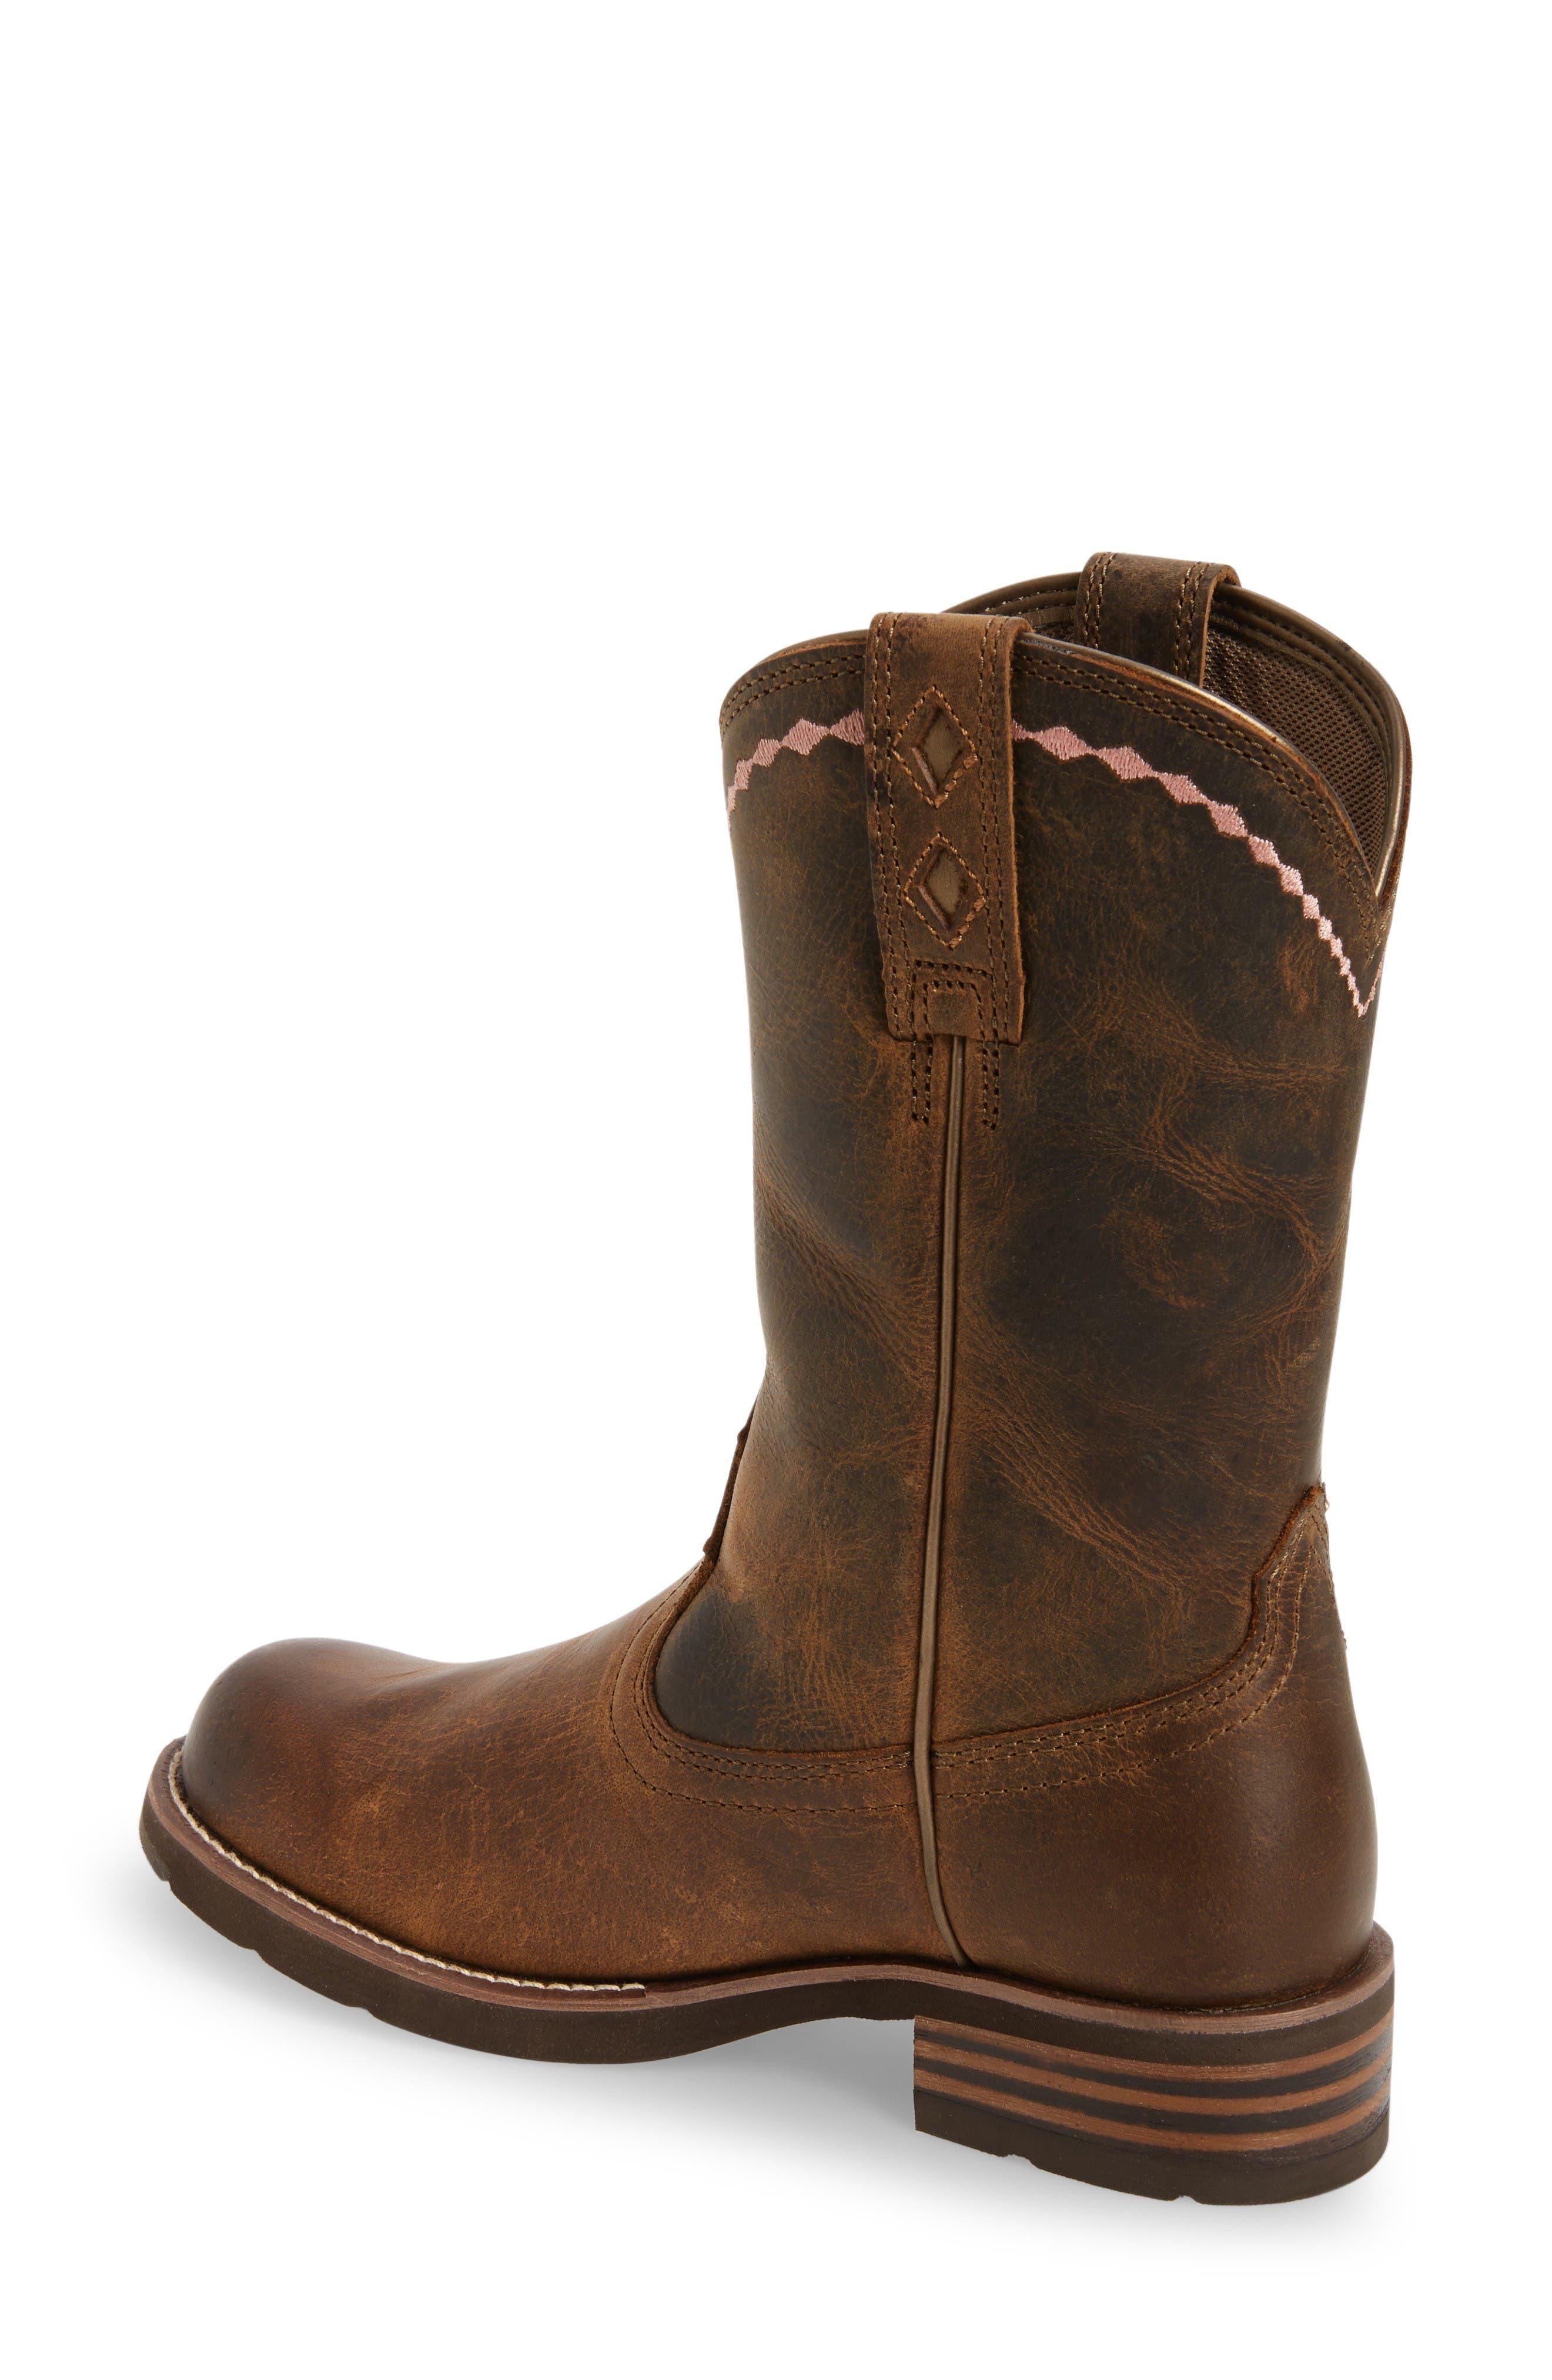 Alternate Image 2  - Ariat Unbridled Roper Western Boot (Women)